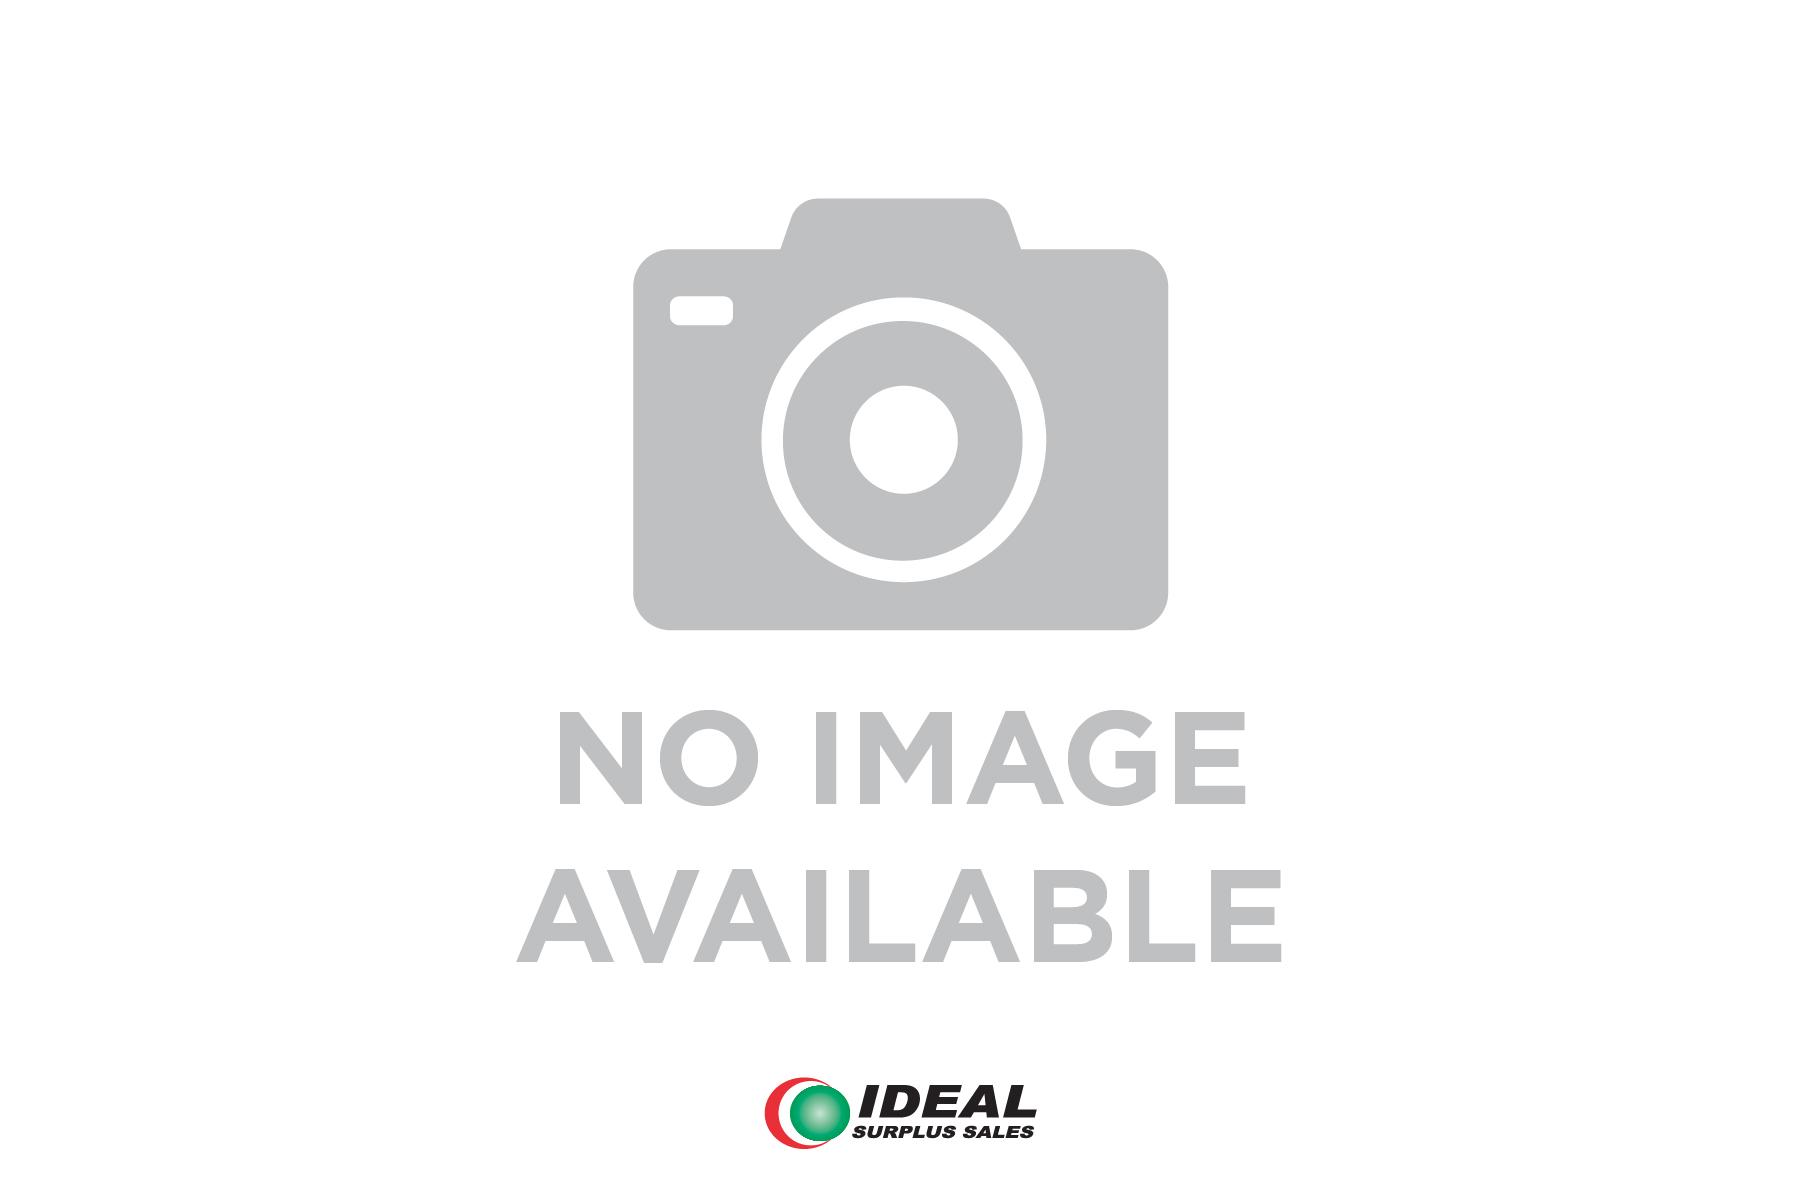 SIEMENS IPC547D WORKSTATION